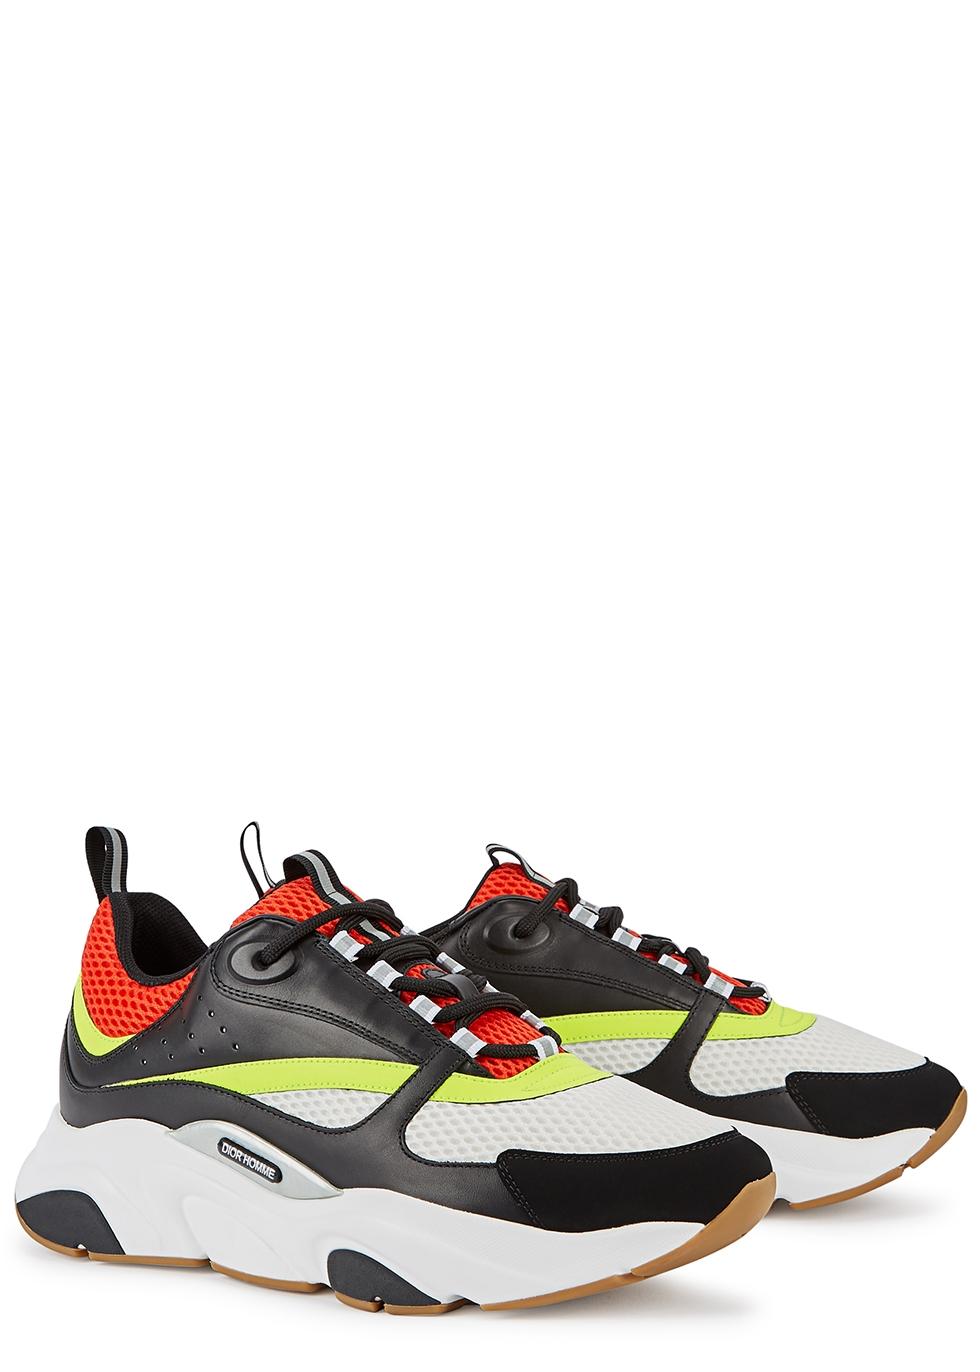 competitive price 9edb5 92cc1 Men s Designer Trainers, Sneakers   Sports Shoes - Harvey Nichols